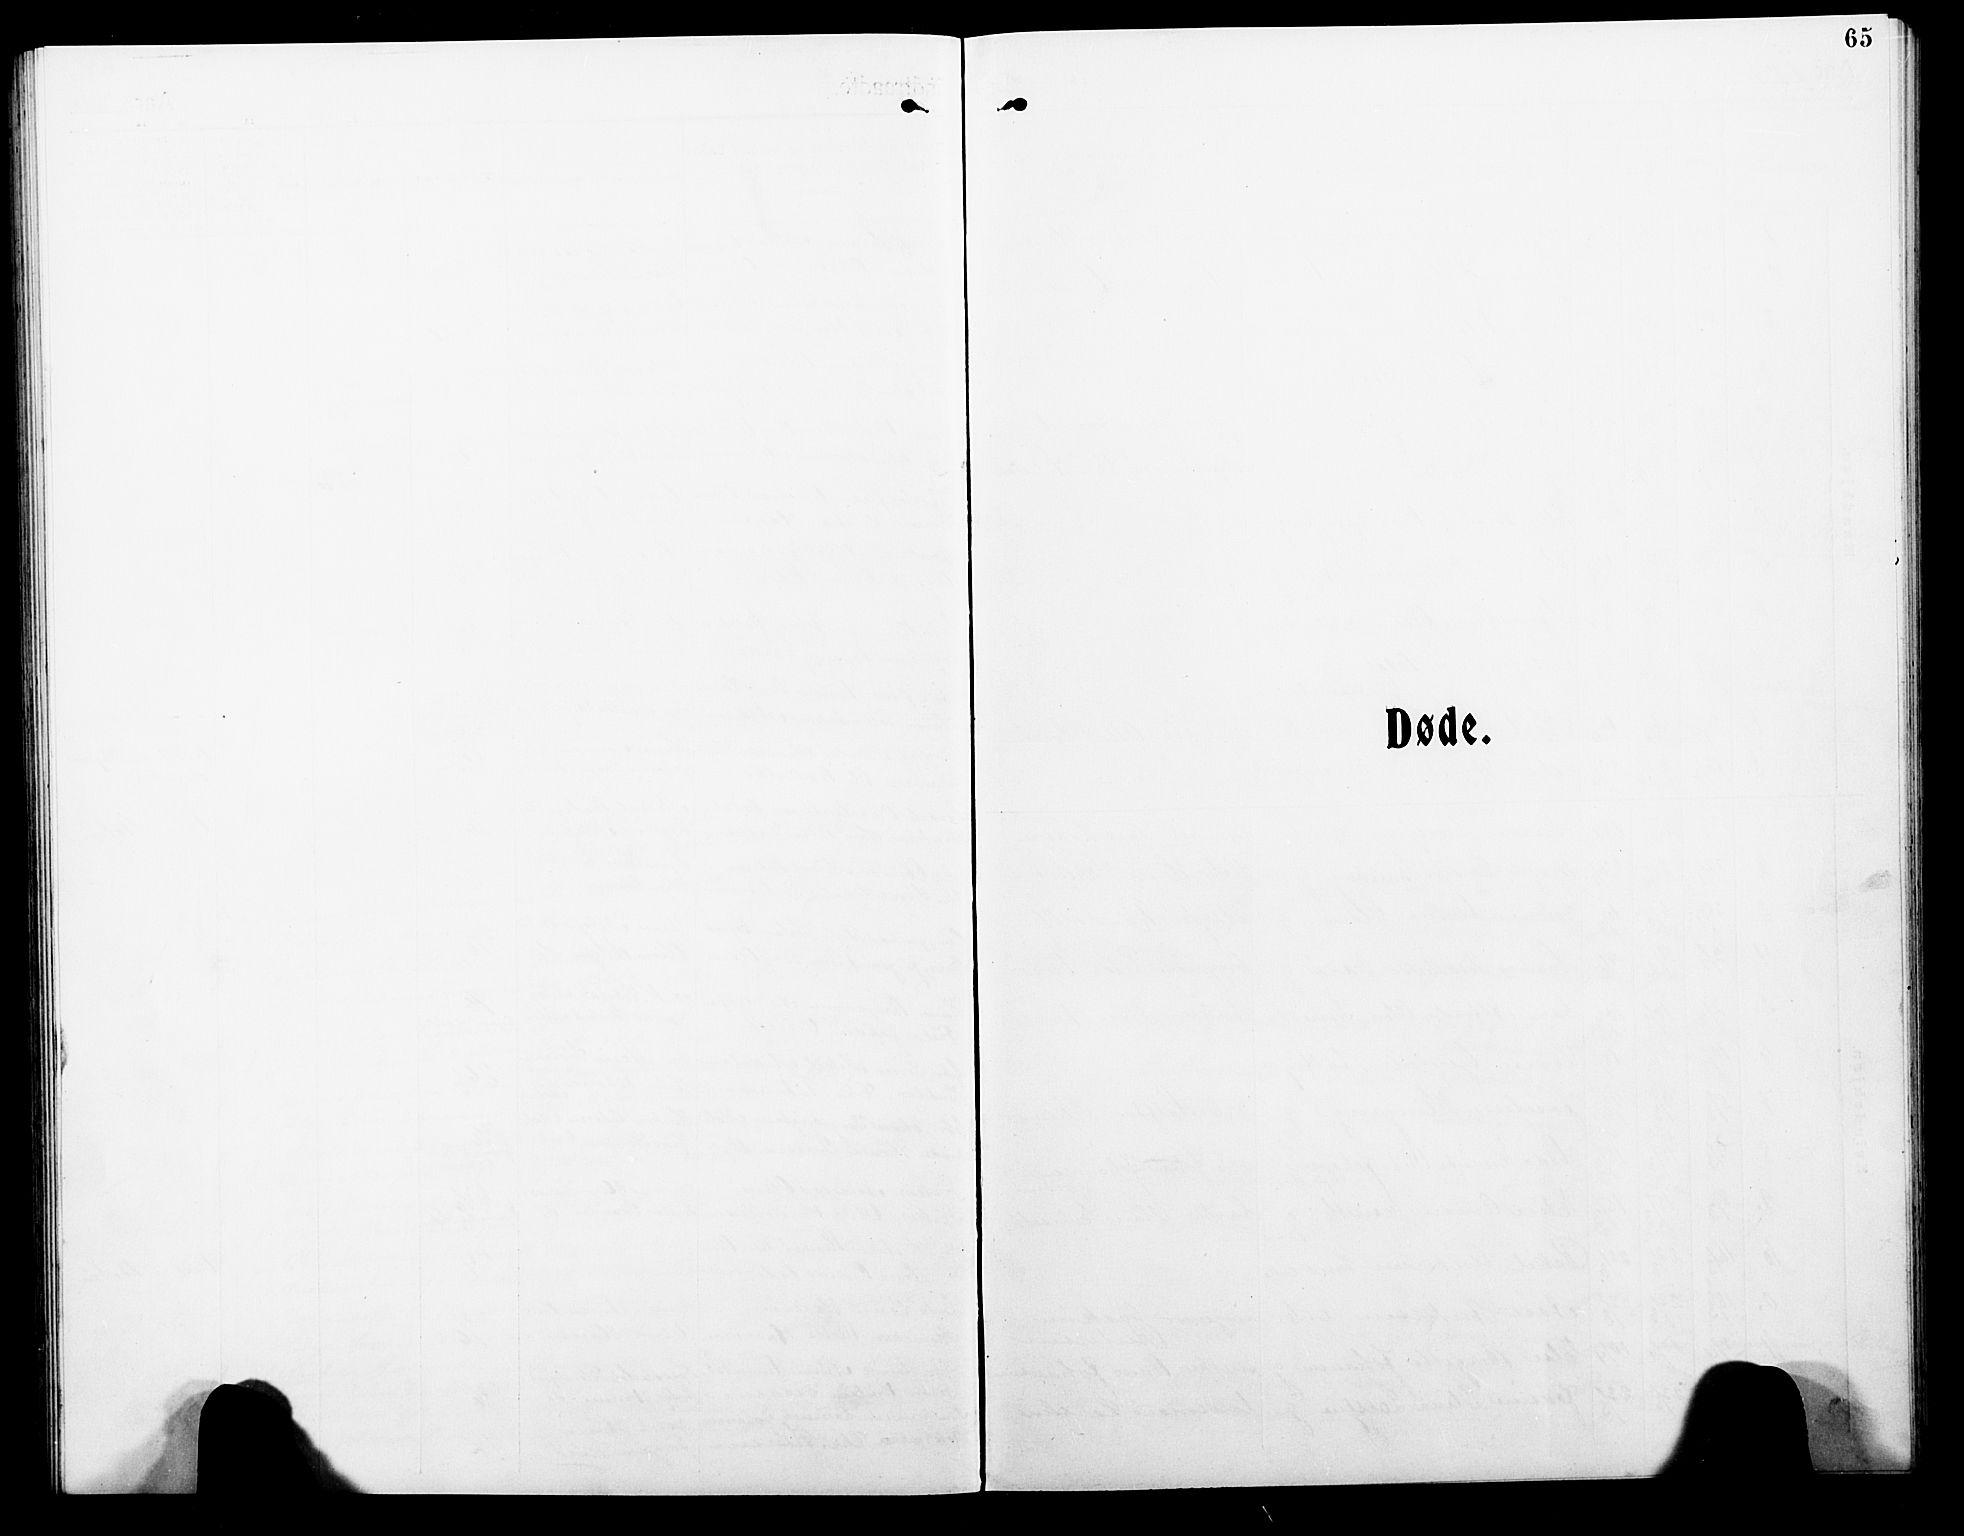 SAT, Ministerialprotokoller, klokkerbøker og fødselsregistre - Nordland, 801/L0035: Klokkerbok nr. 801C10, 1910-1923, s. 65